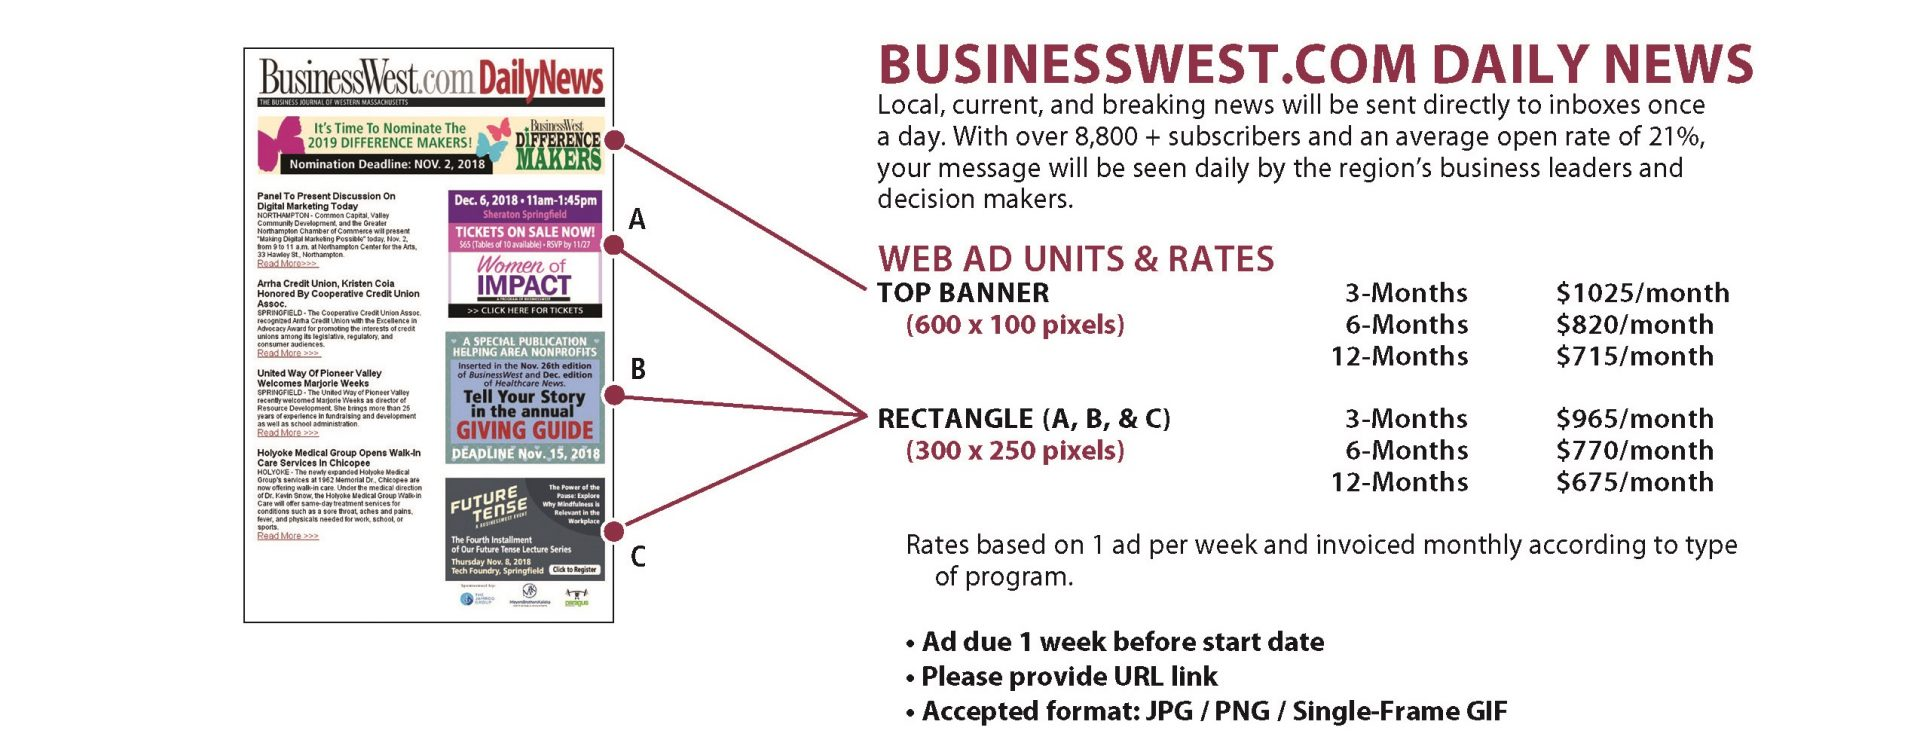 Ad Rates/Stats